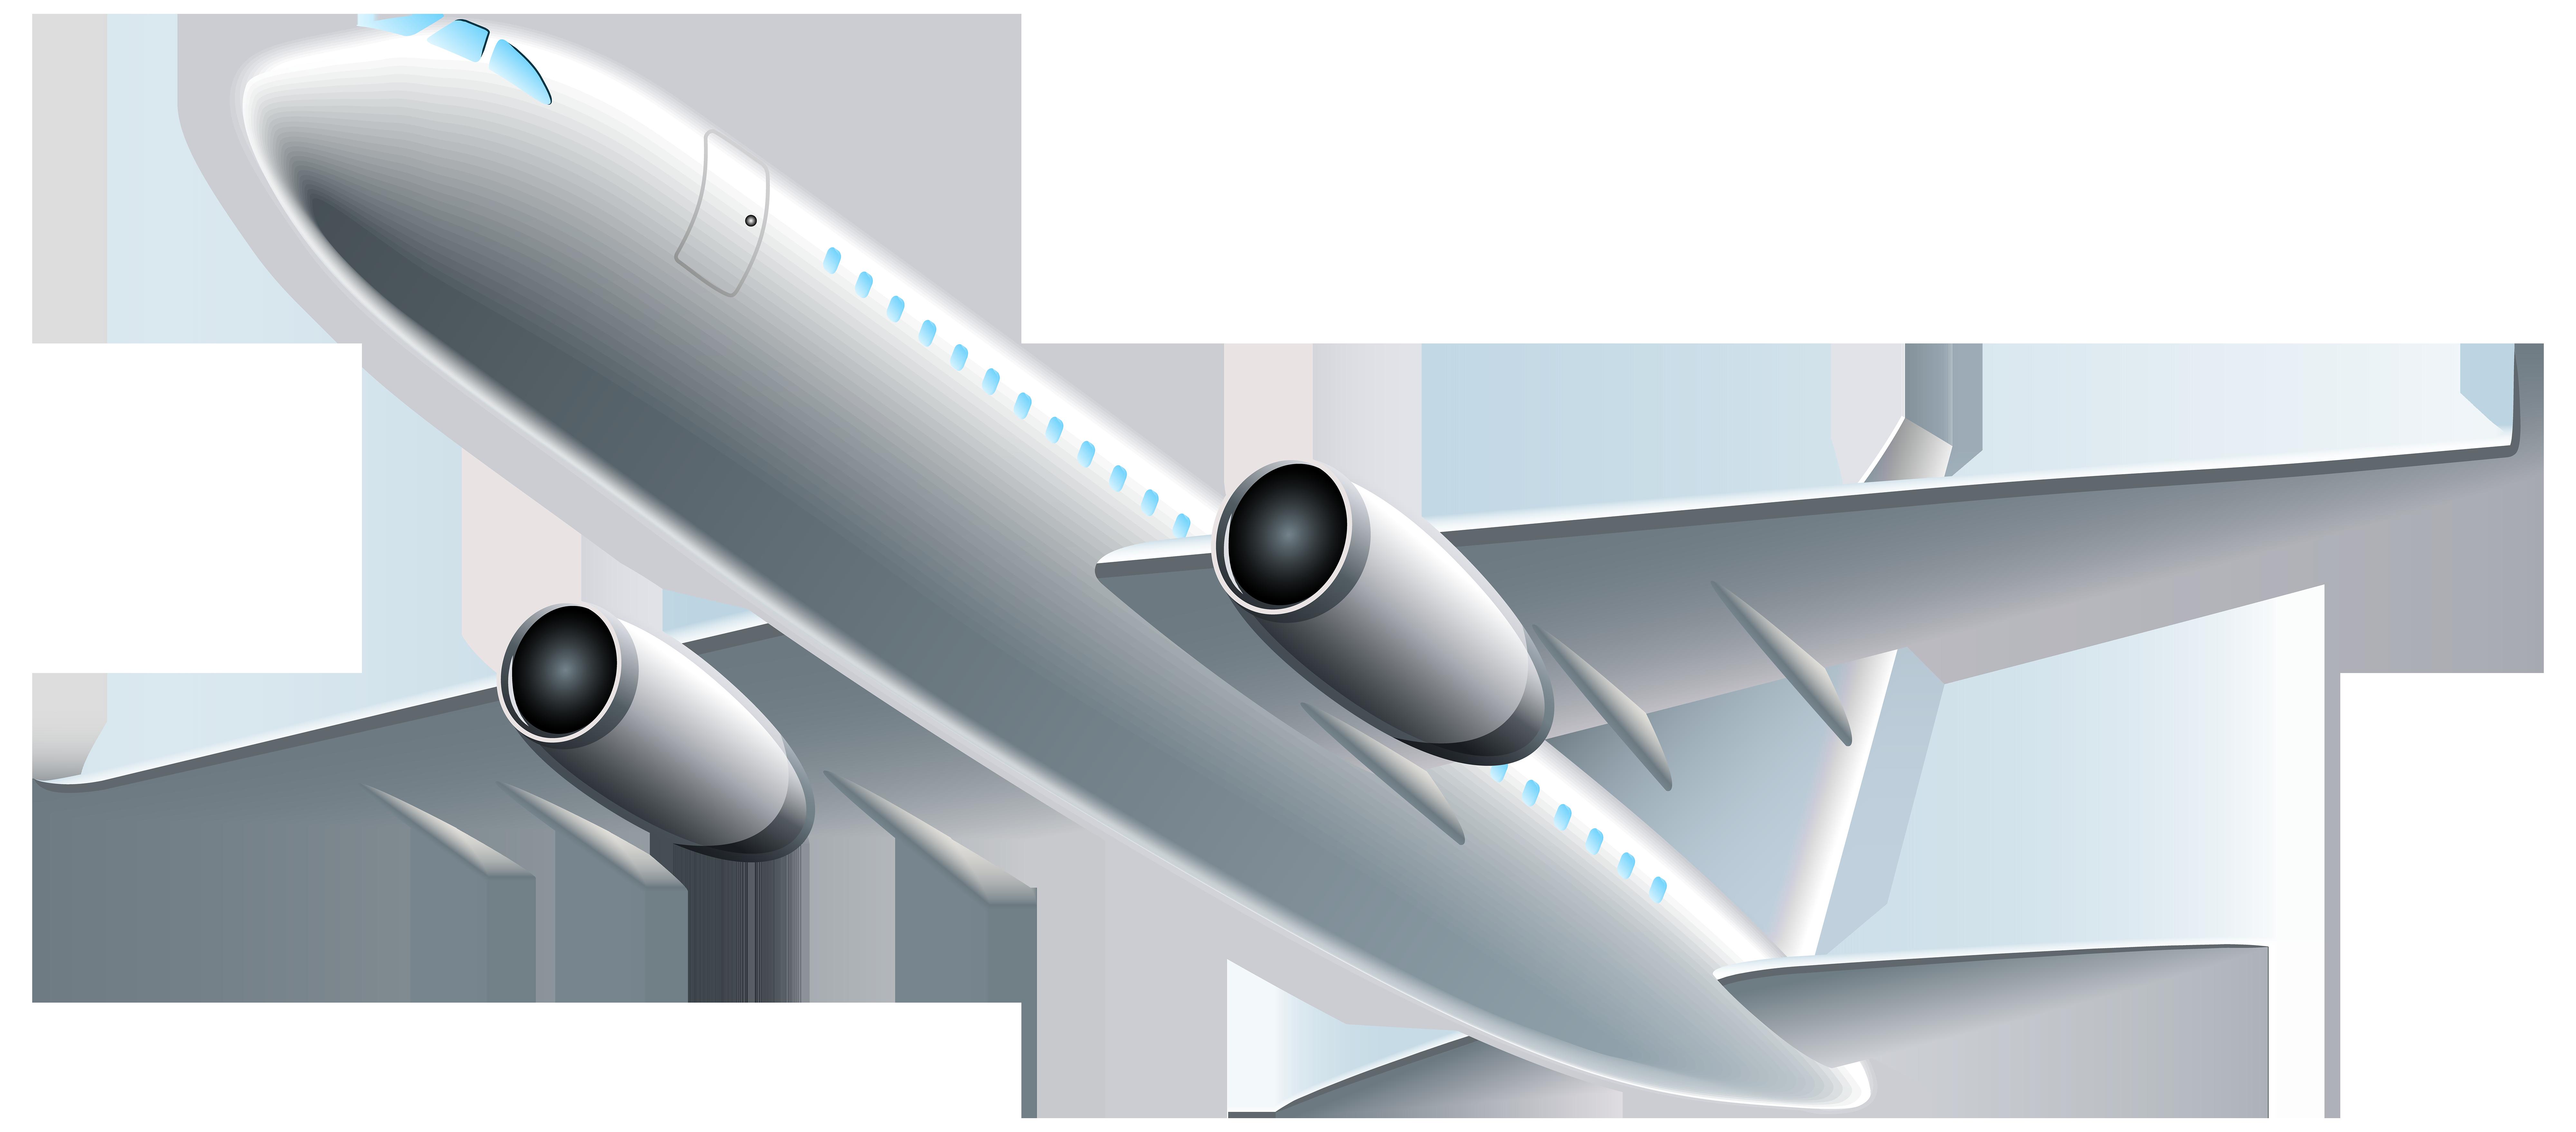 Engine clipart airplane. Aircraft clip art plane